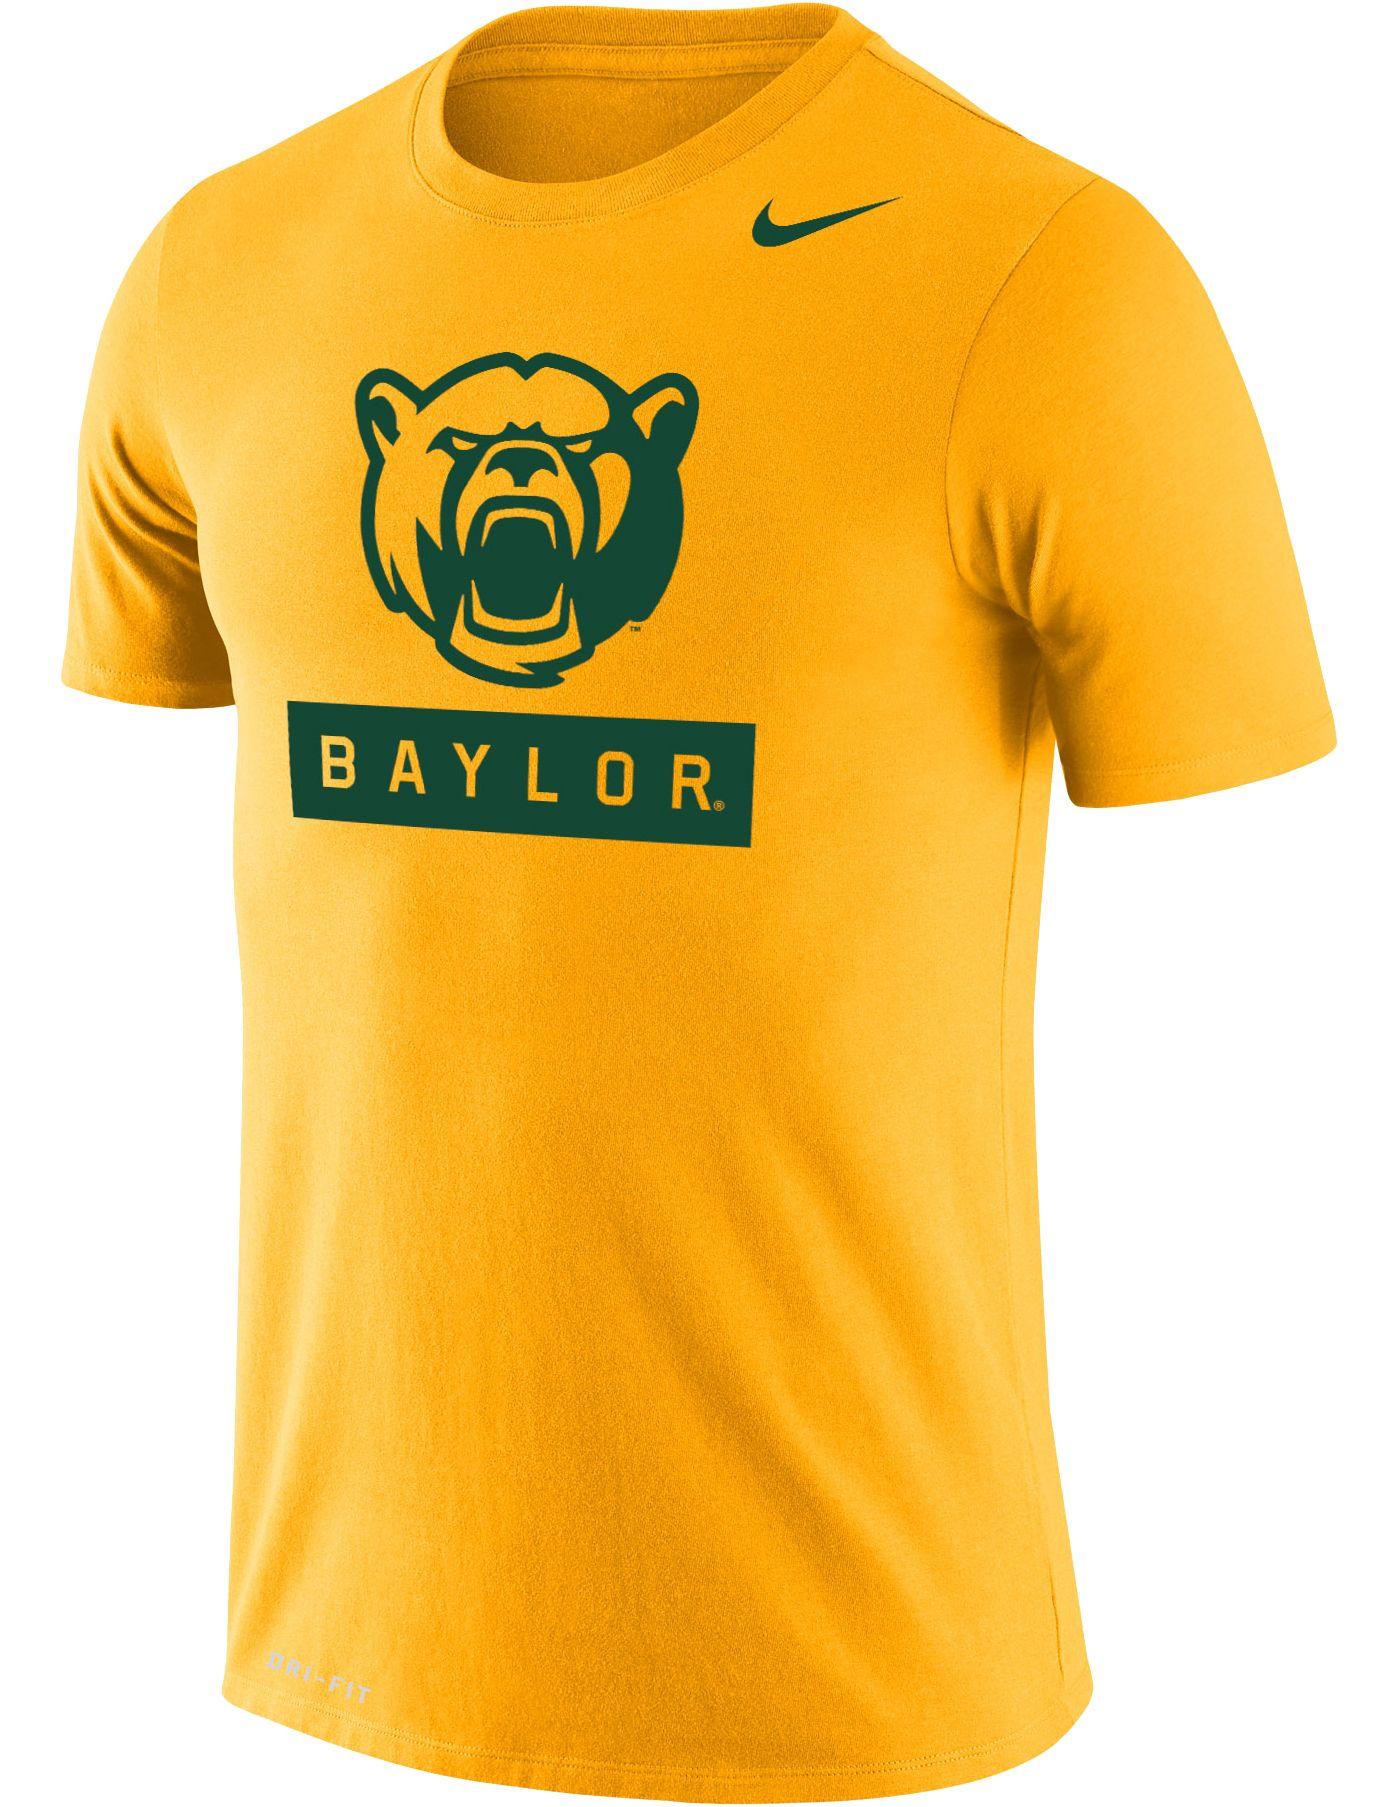 Nike Men's Baylor Bears Gold Dri-FIT Cotton T-Shirt